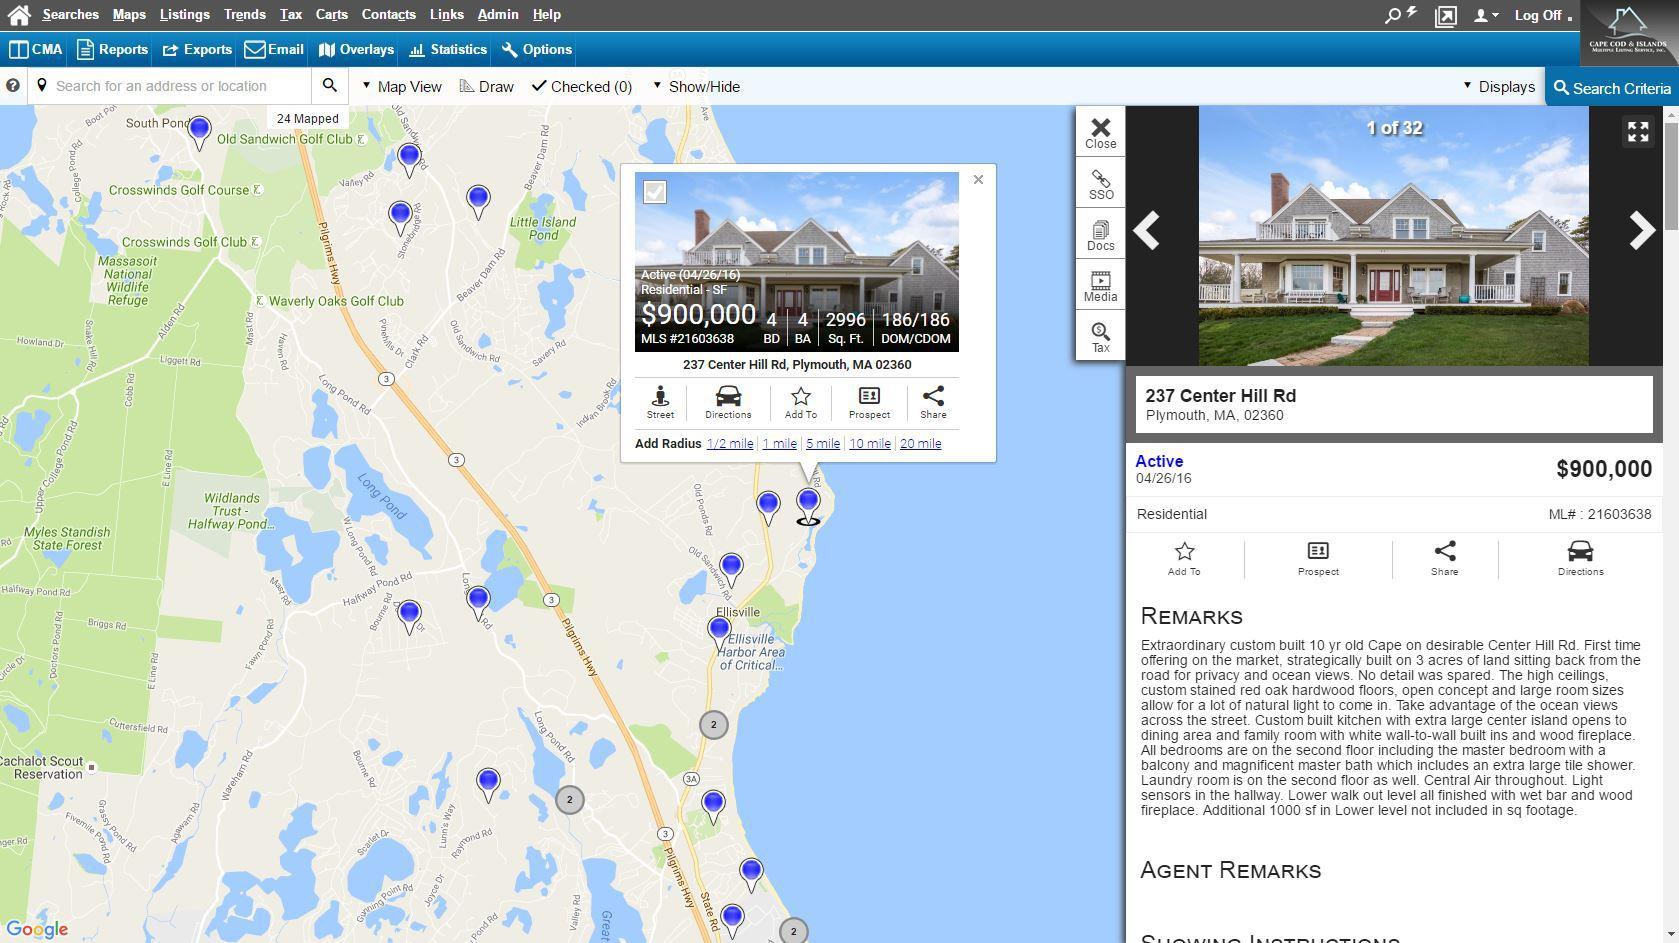 Screenshot of Rapattoni's interactive map search